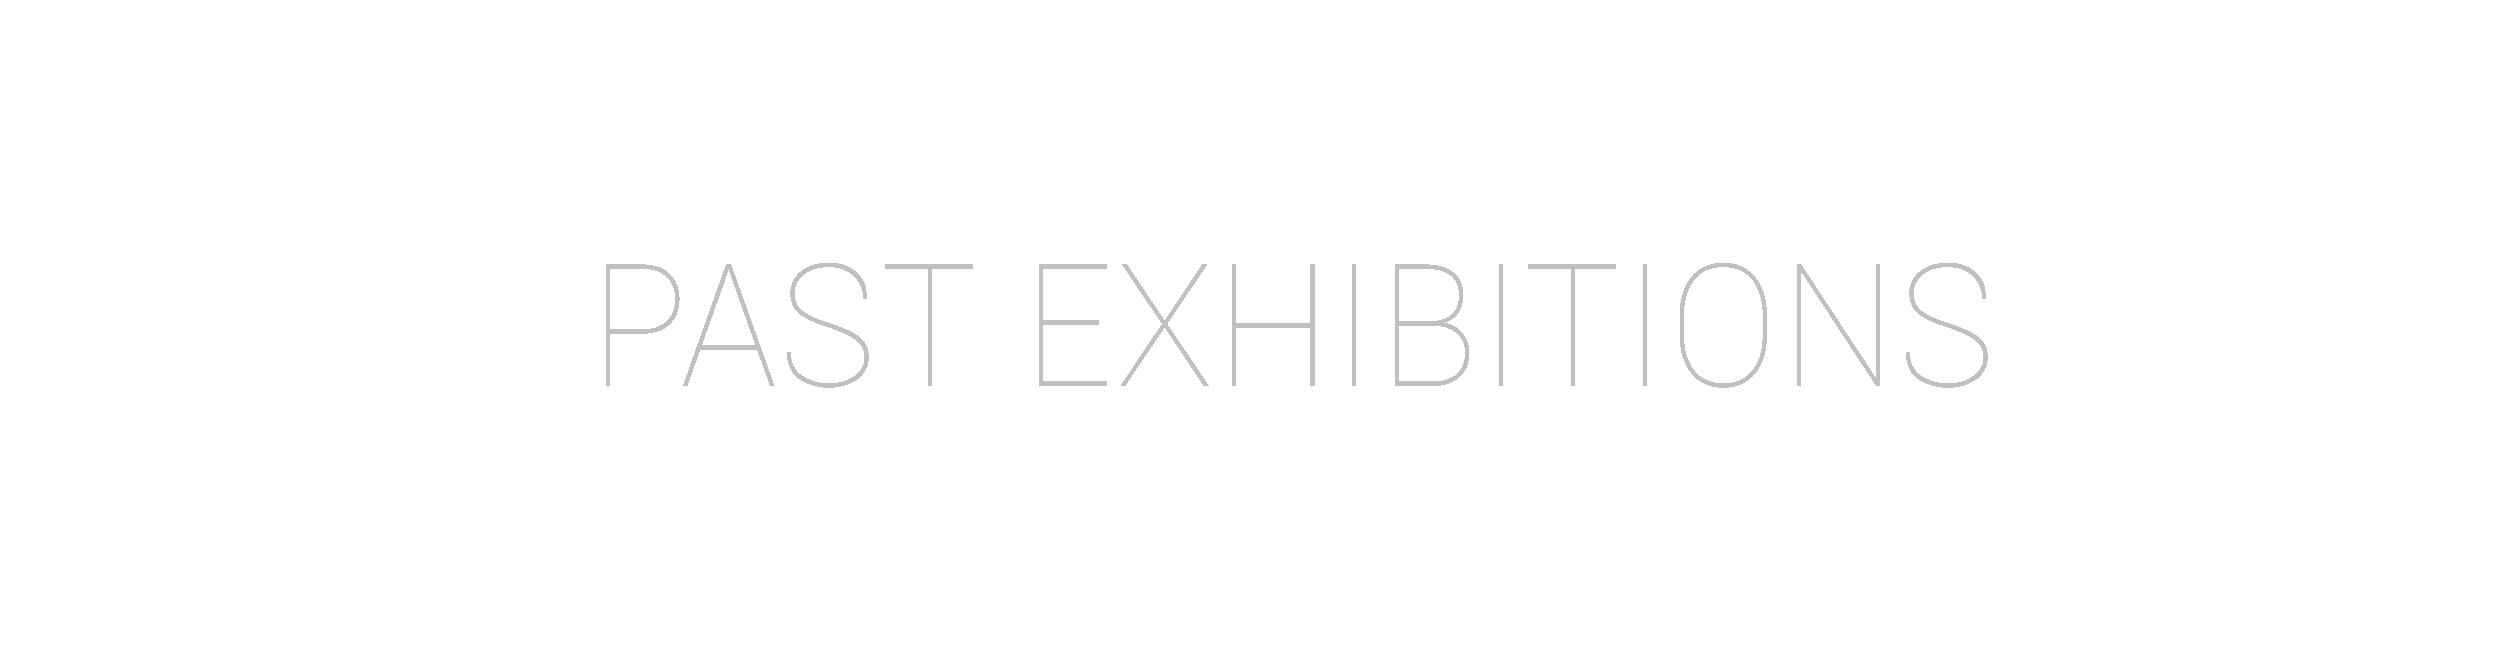 past exhibitions banner.jpg